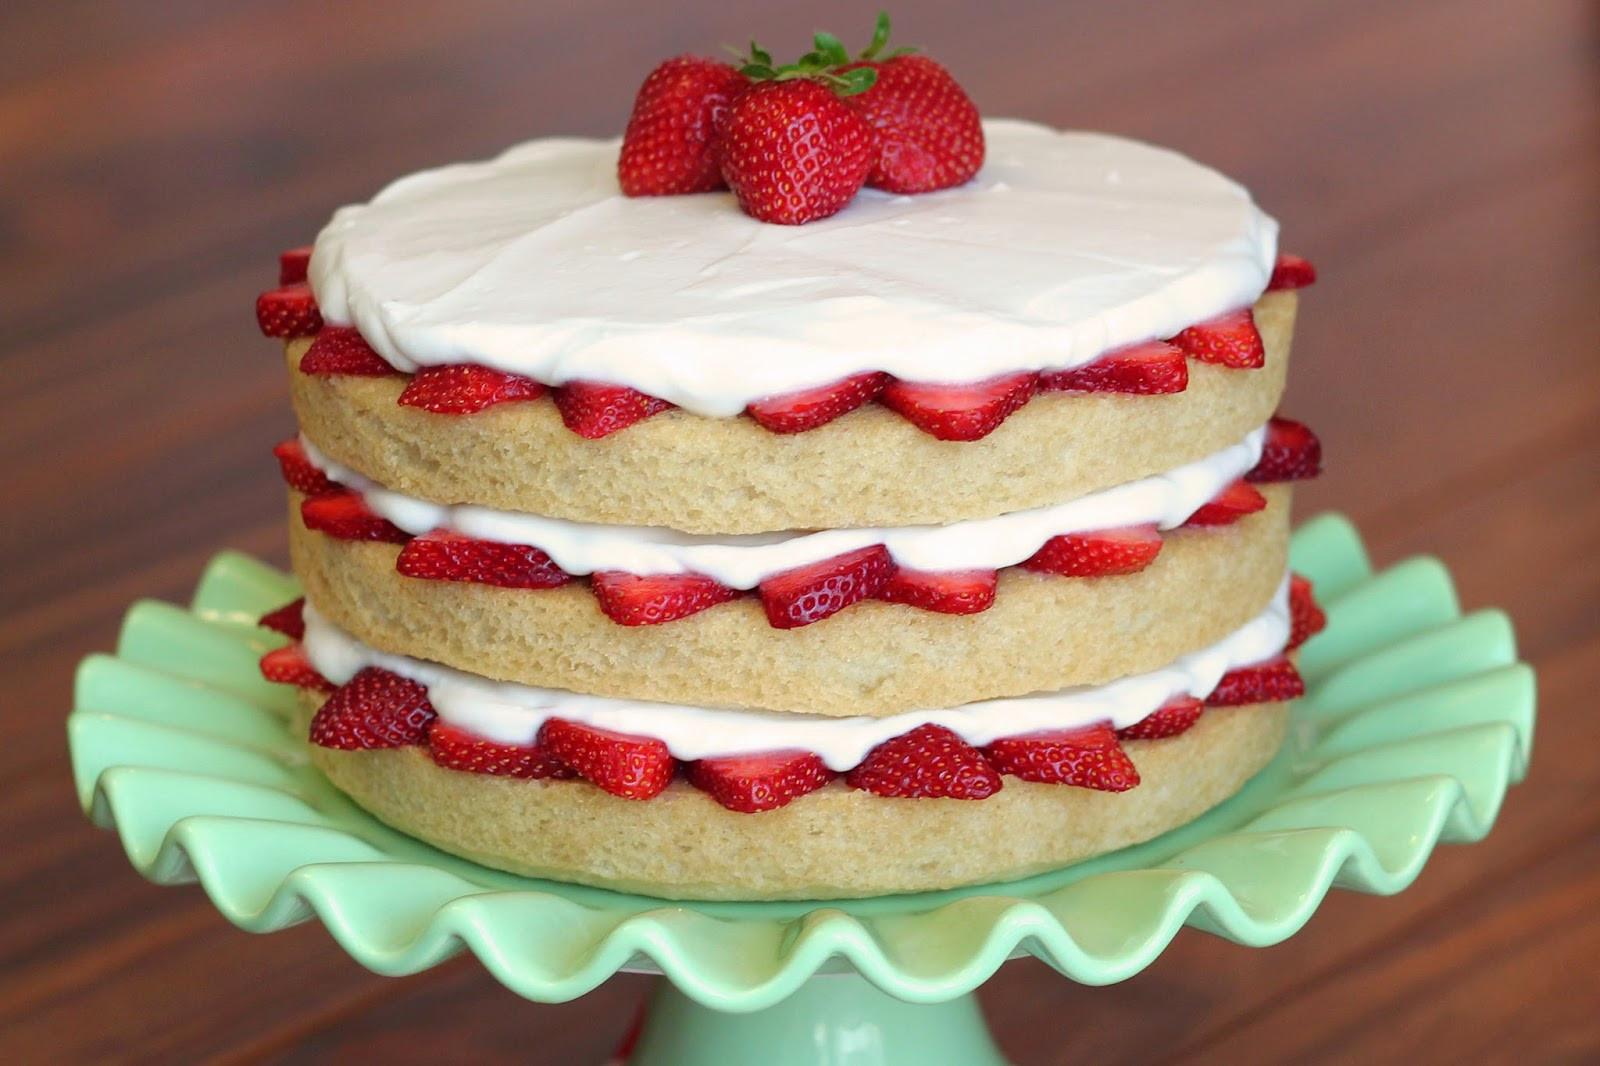 Strawberry Shortcake Videos  gluten free vegan strawberry shortcake Sarah Bakes